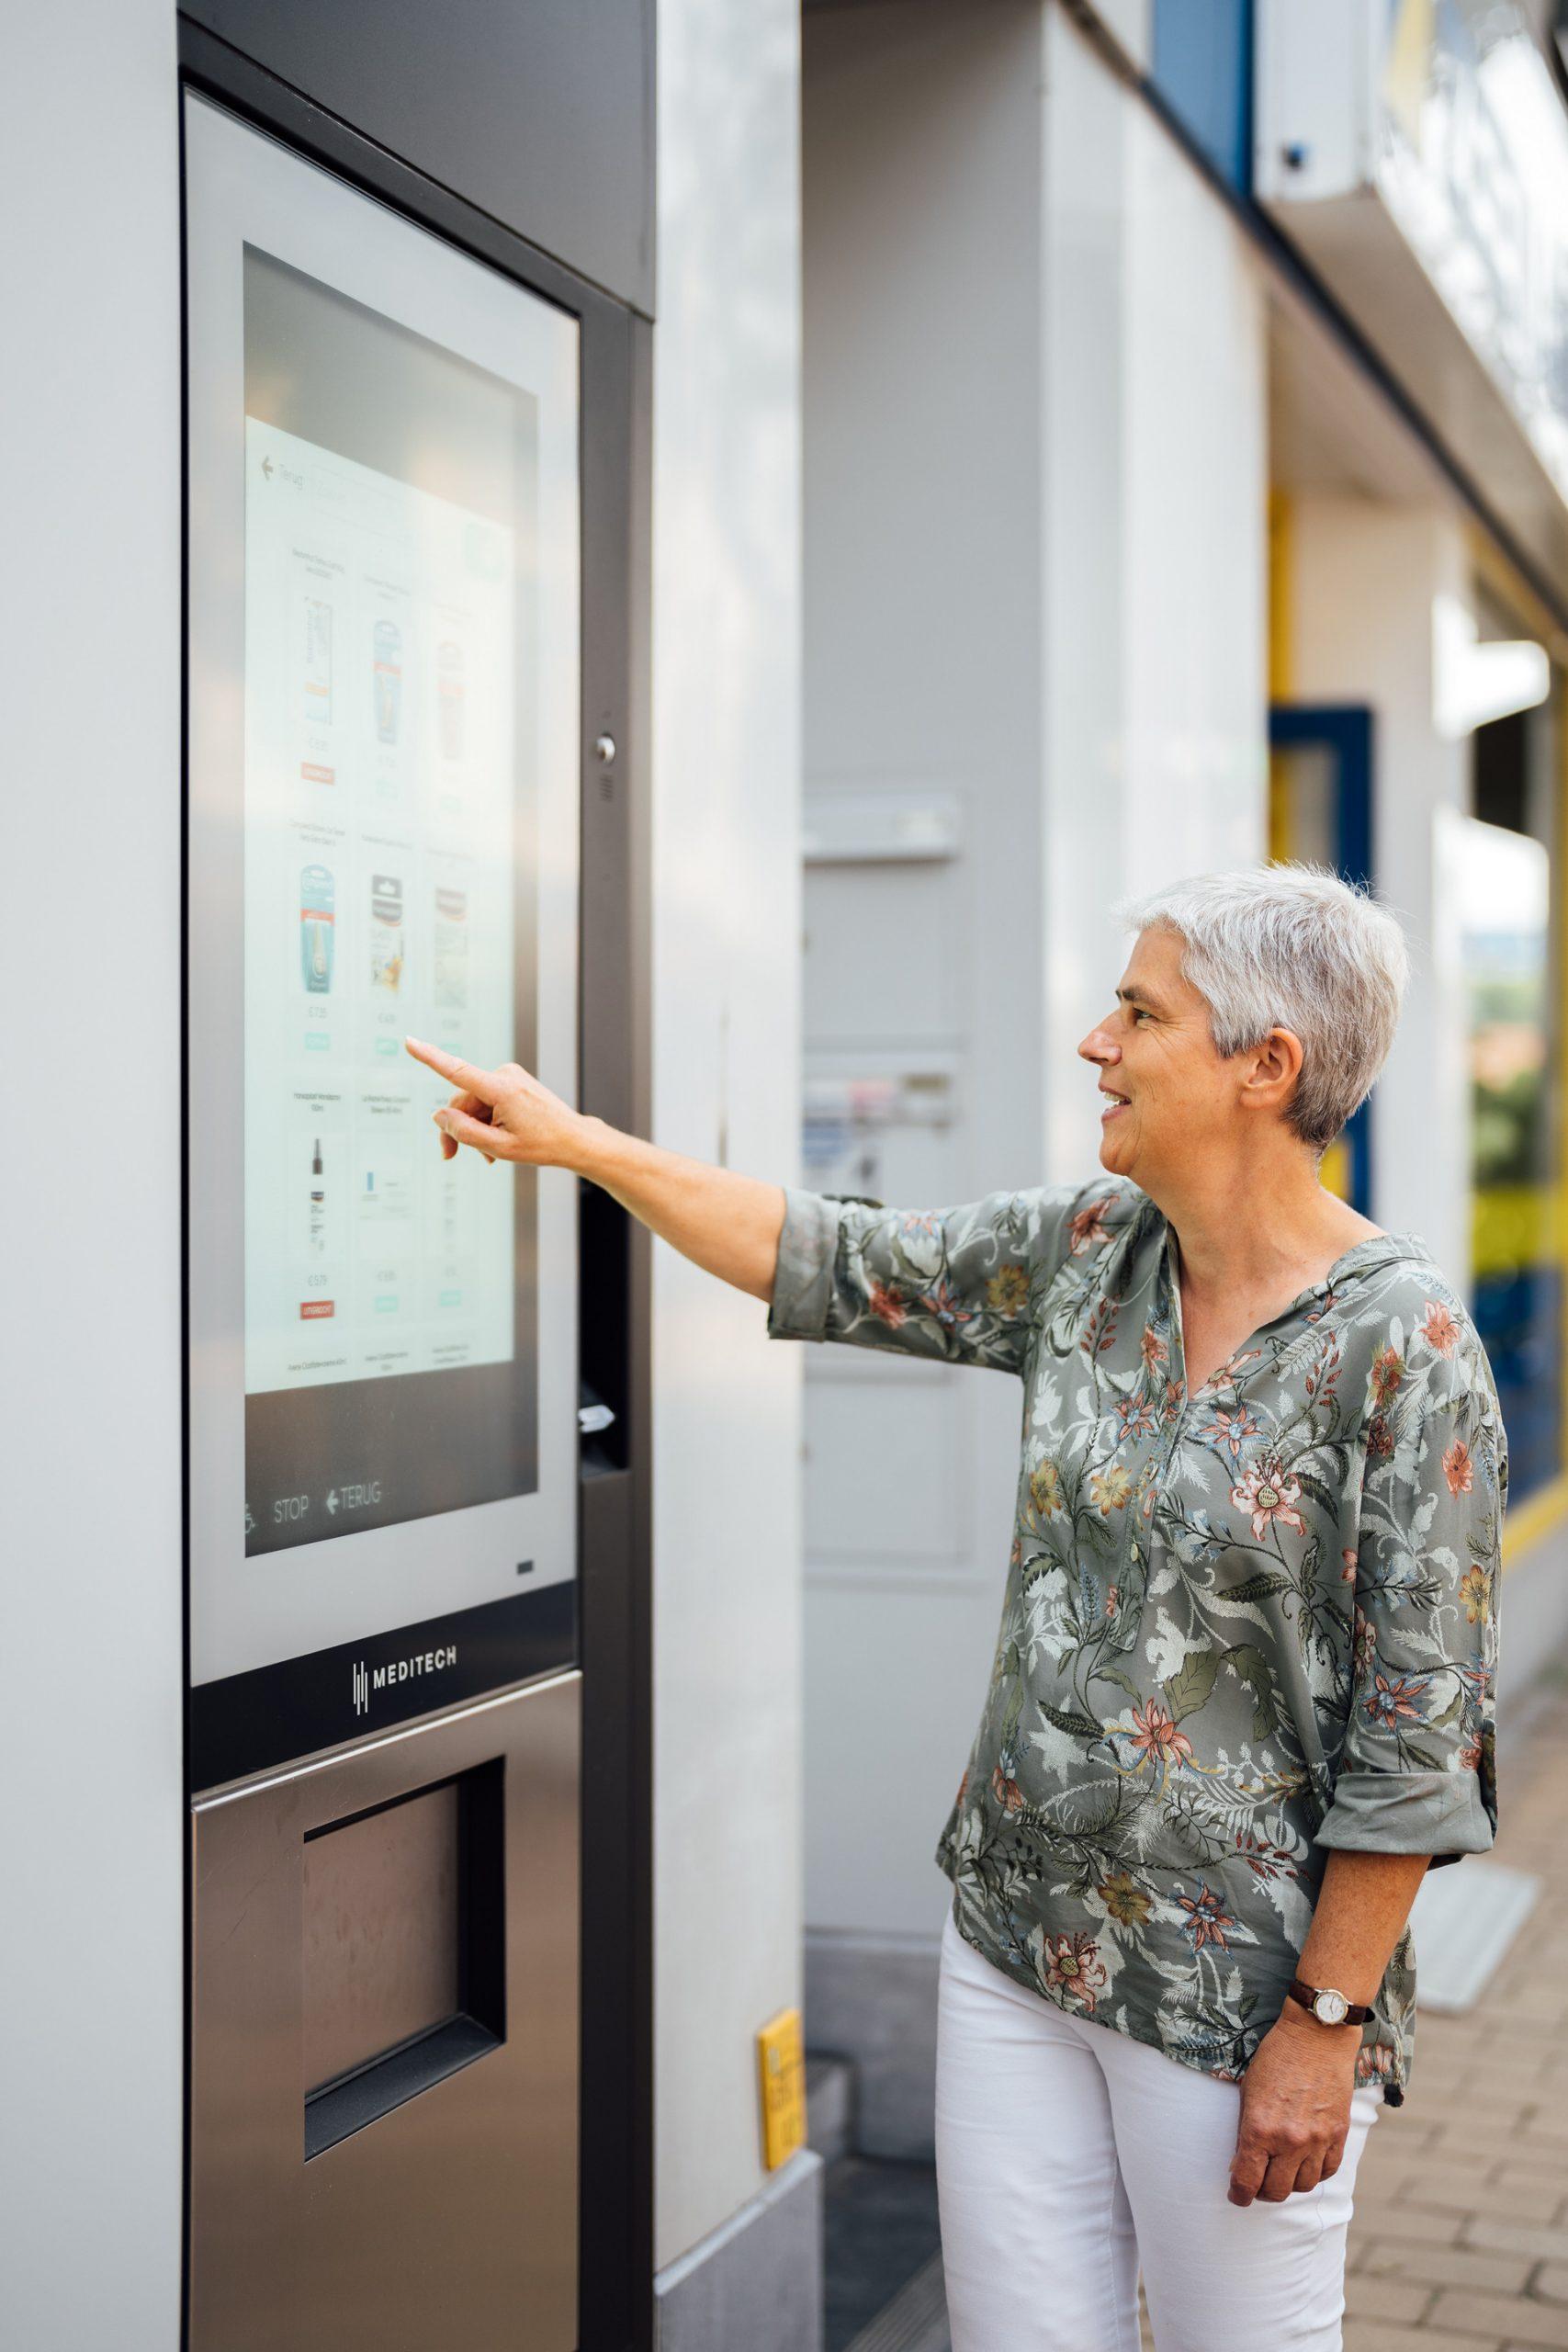 Muurautomaat